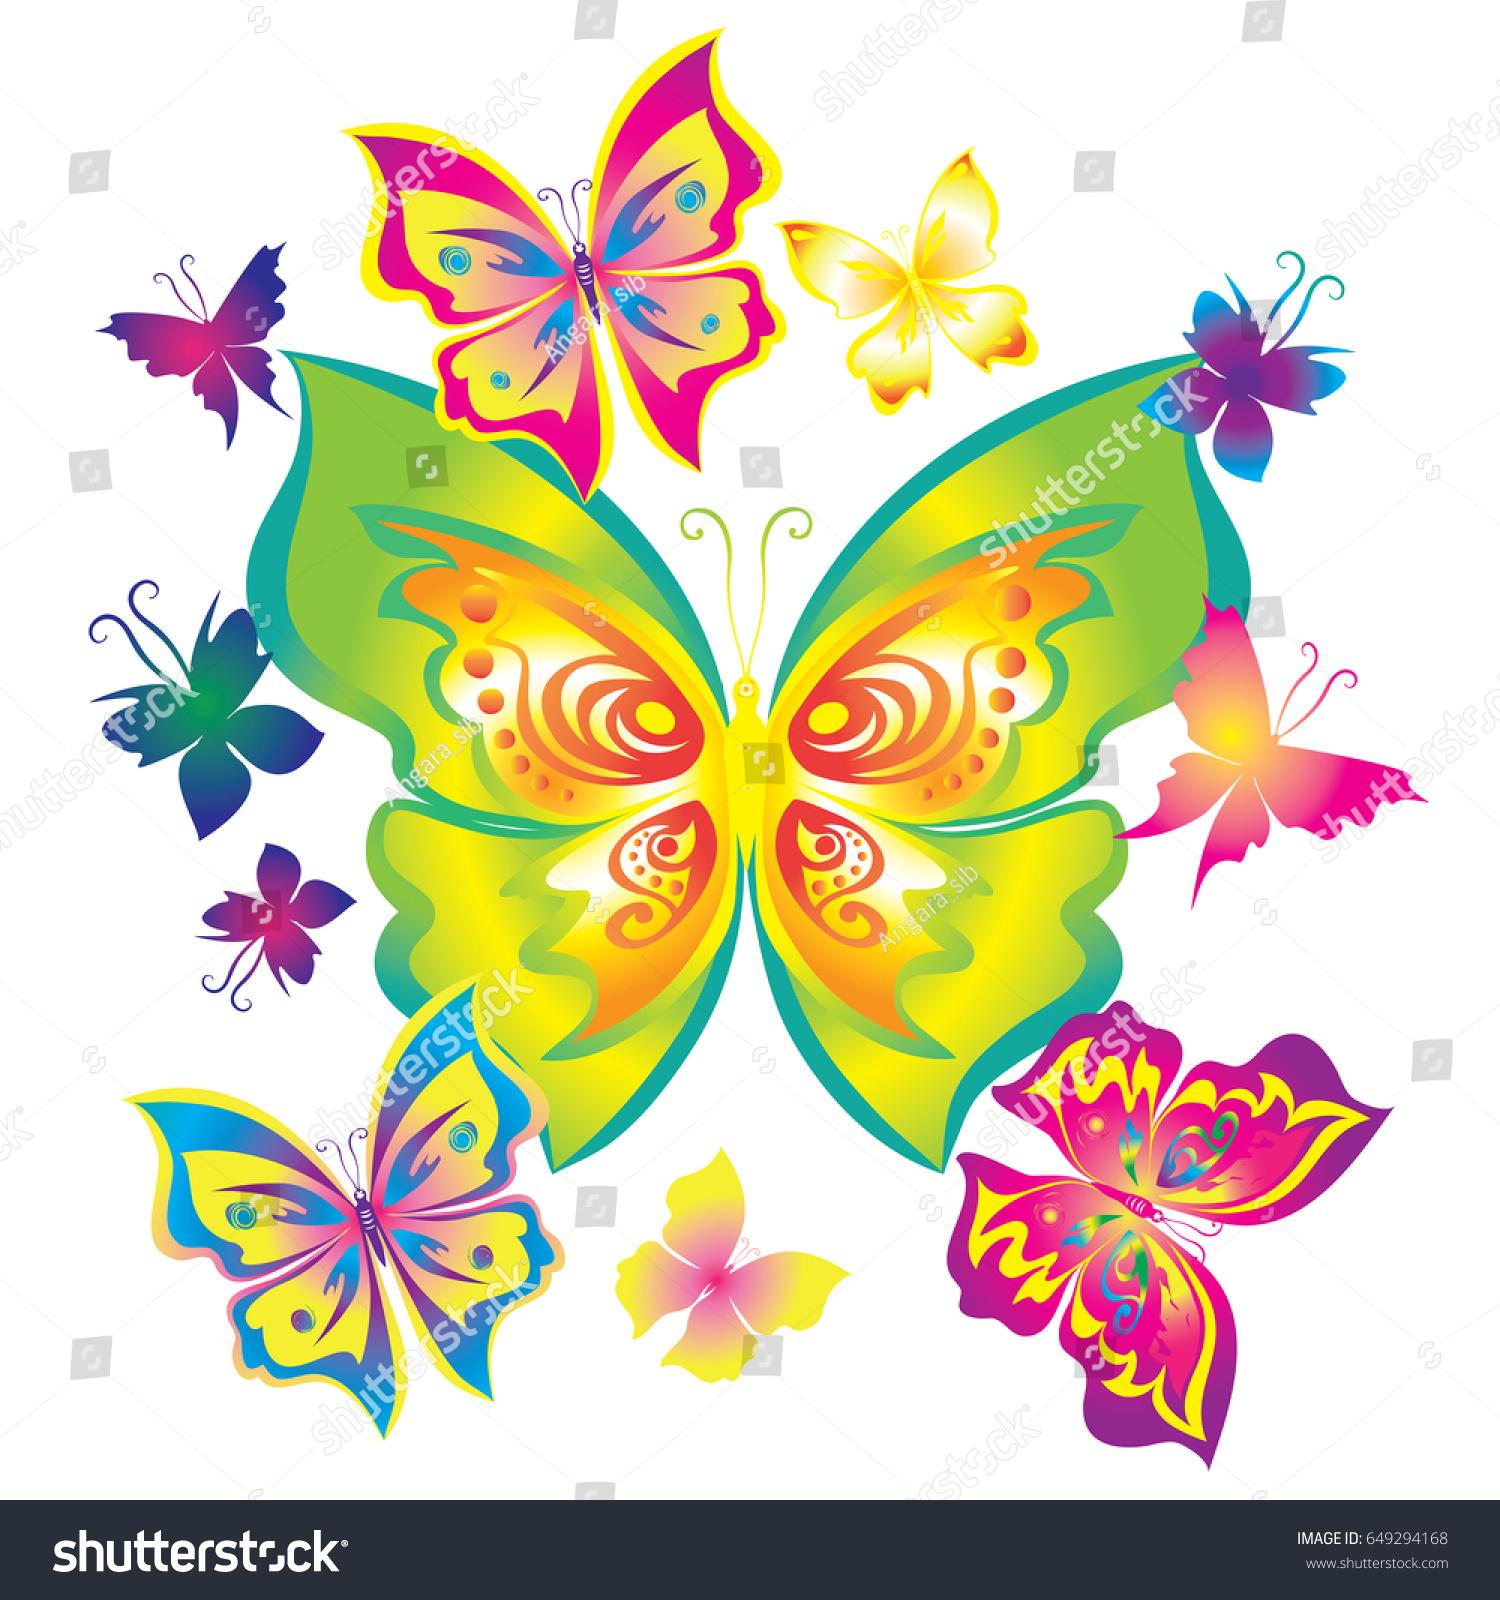 Silhouette Butterfly Gradient Vector Decoration Butterflies Stock ...